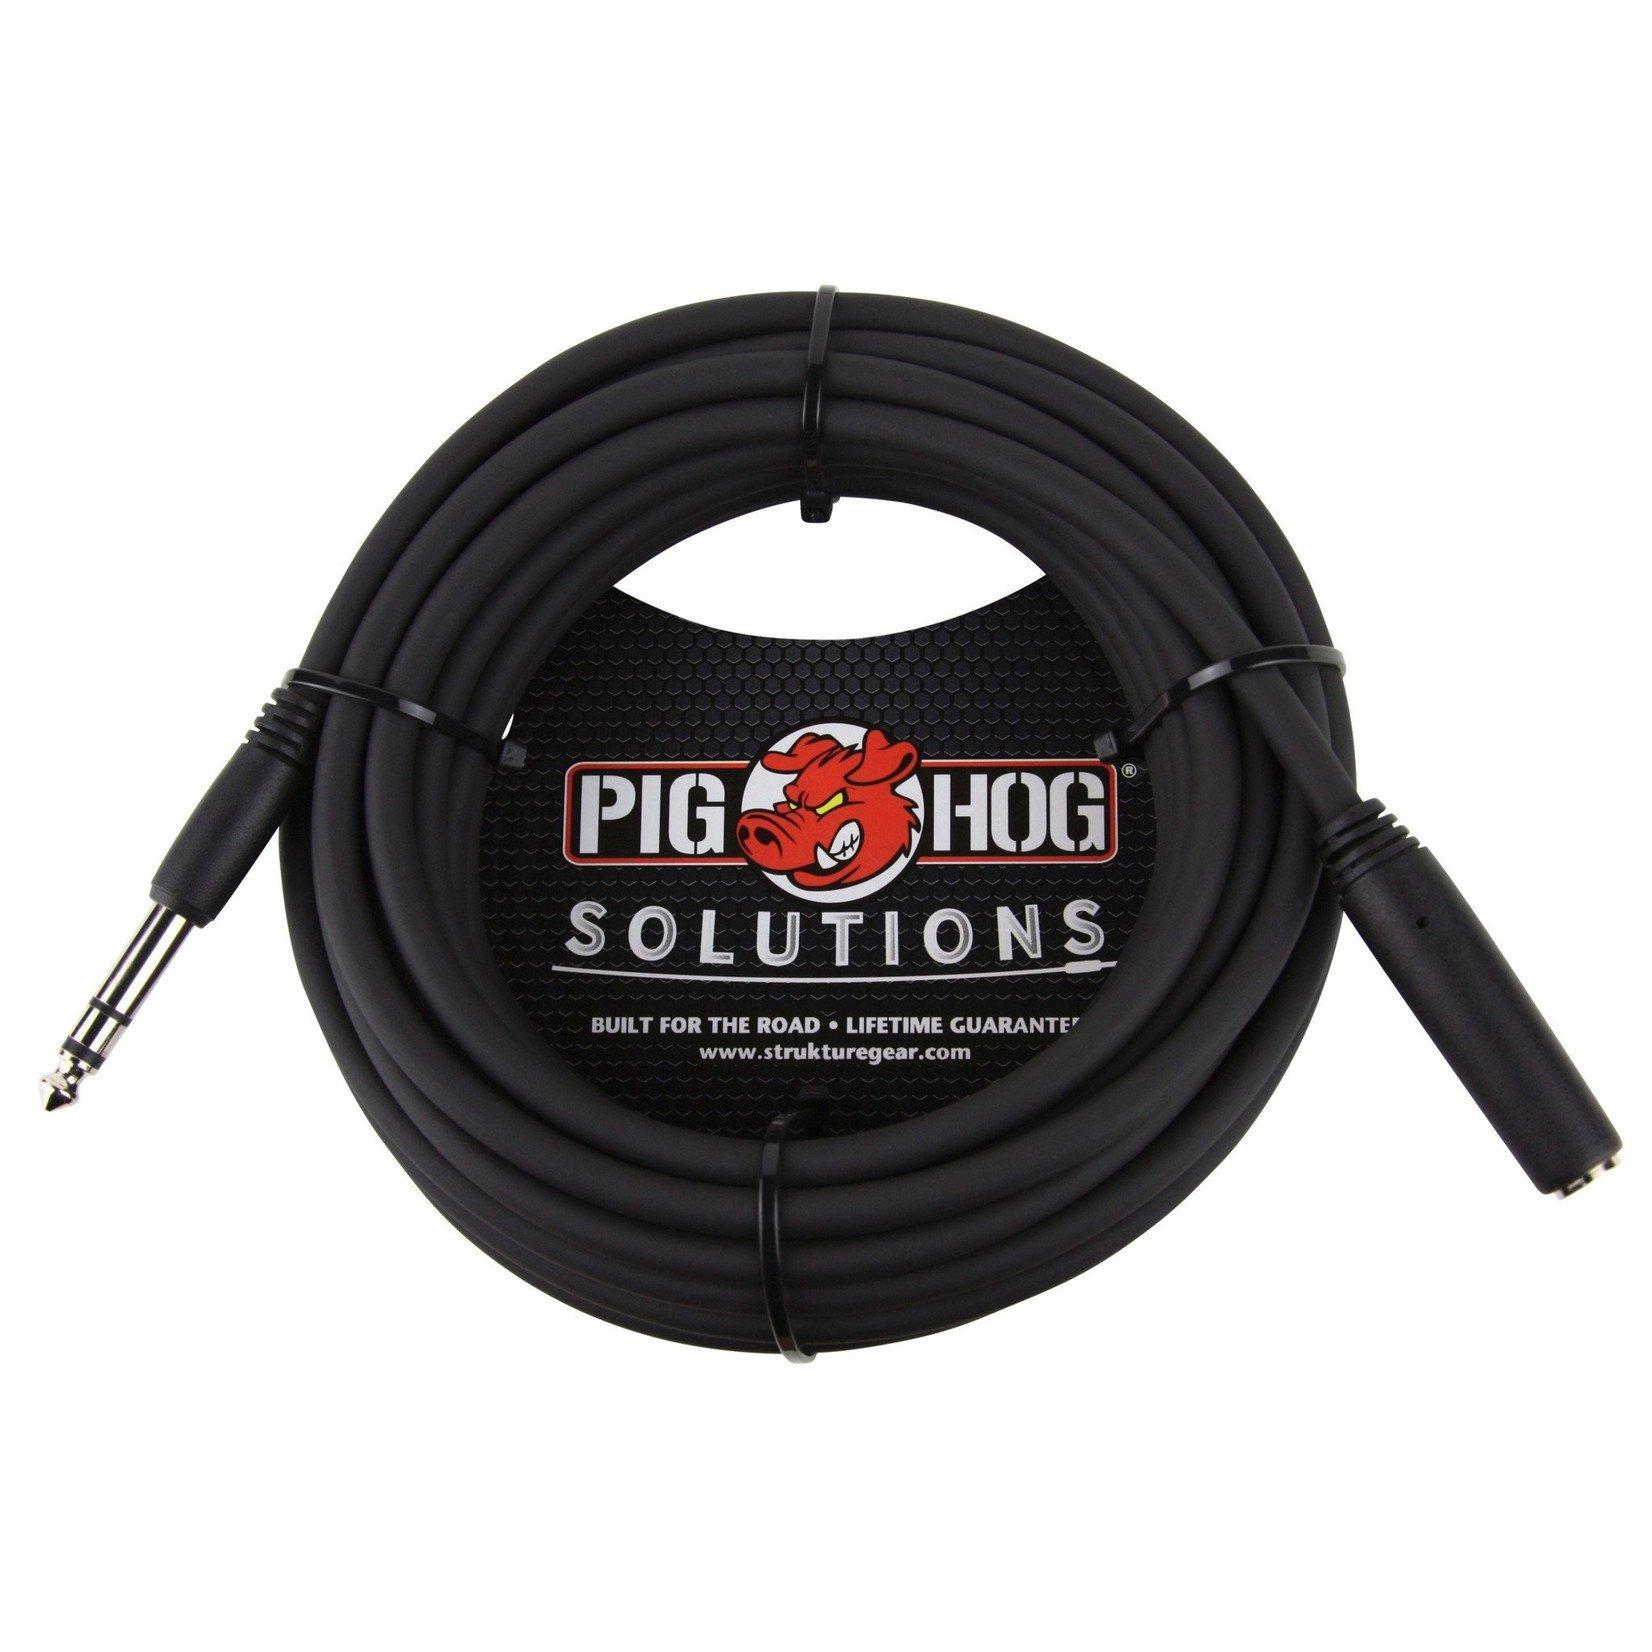 "Pig Hog Pig Hog Solutions 25-foot TRS/Headphone Extension Cable (1/4"" M-F Connectors) PHX14-25"